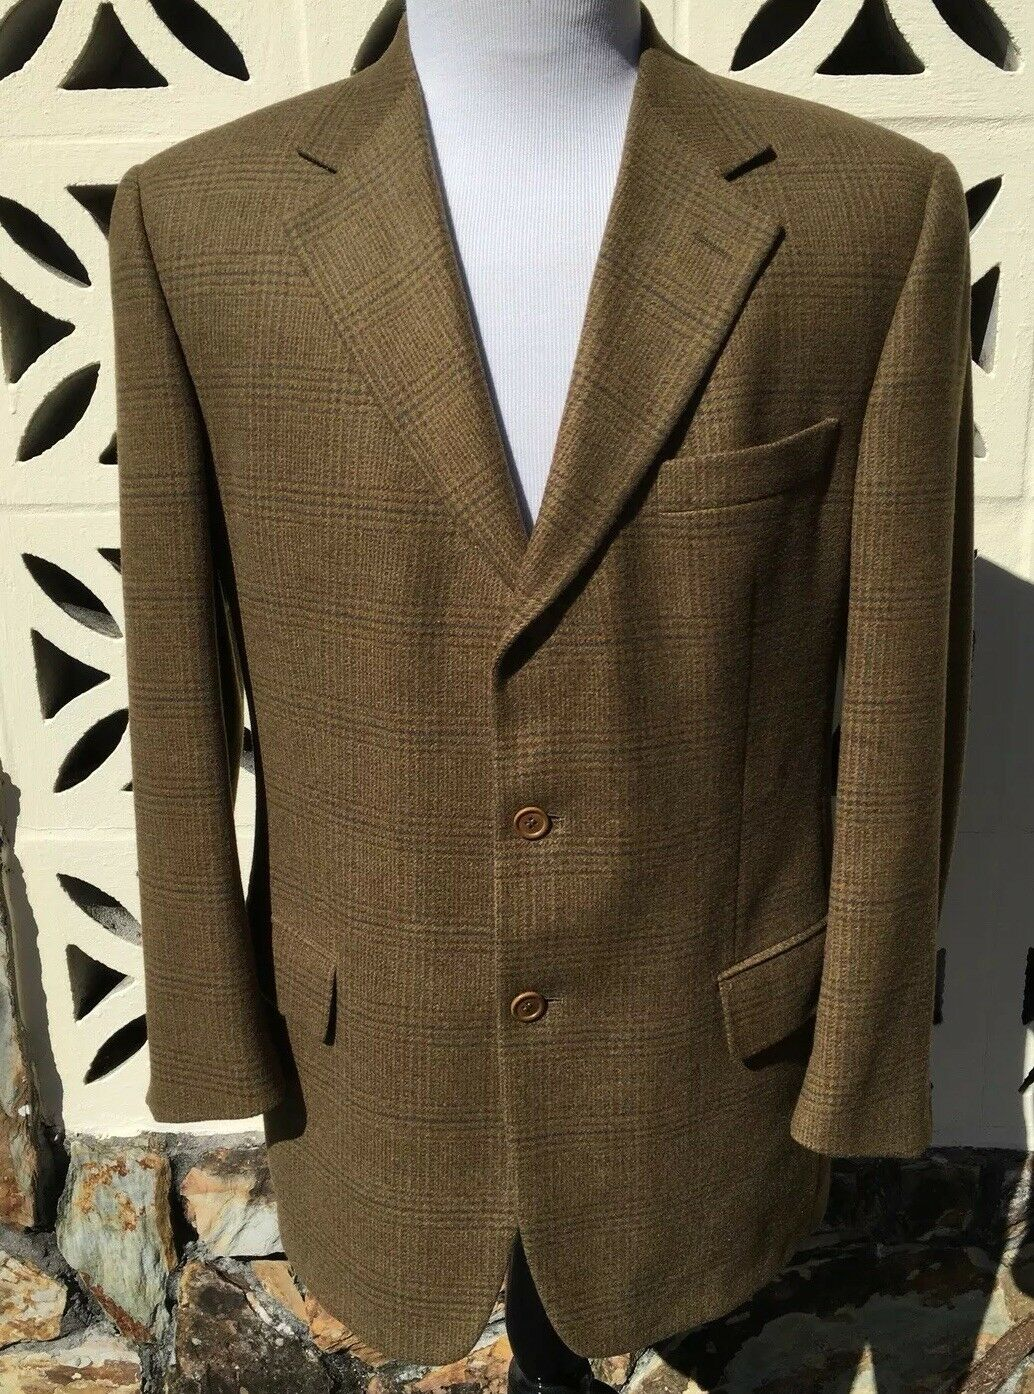 Ermenegildo Zegna Men's Sports Coat Brown Green Purple Houndstooth SOFT 40 R